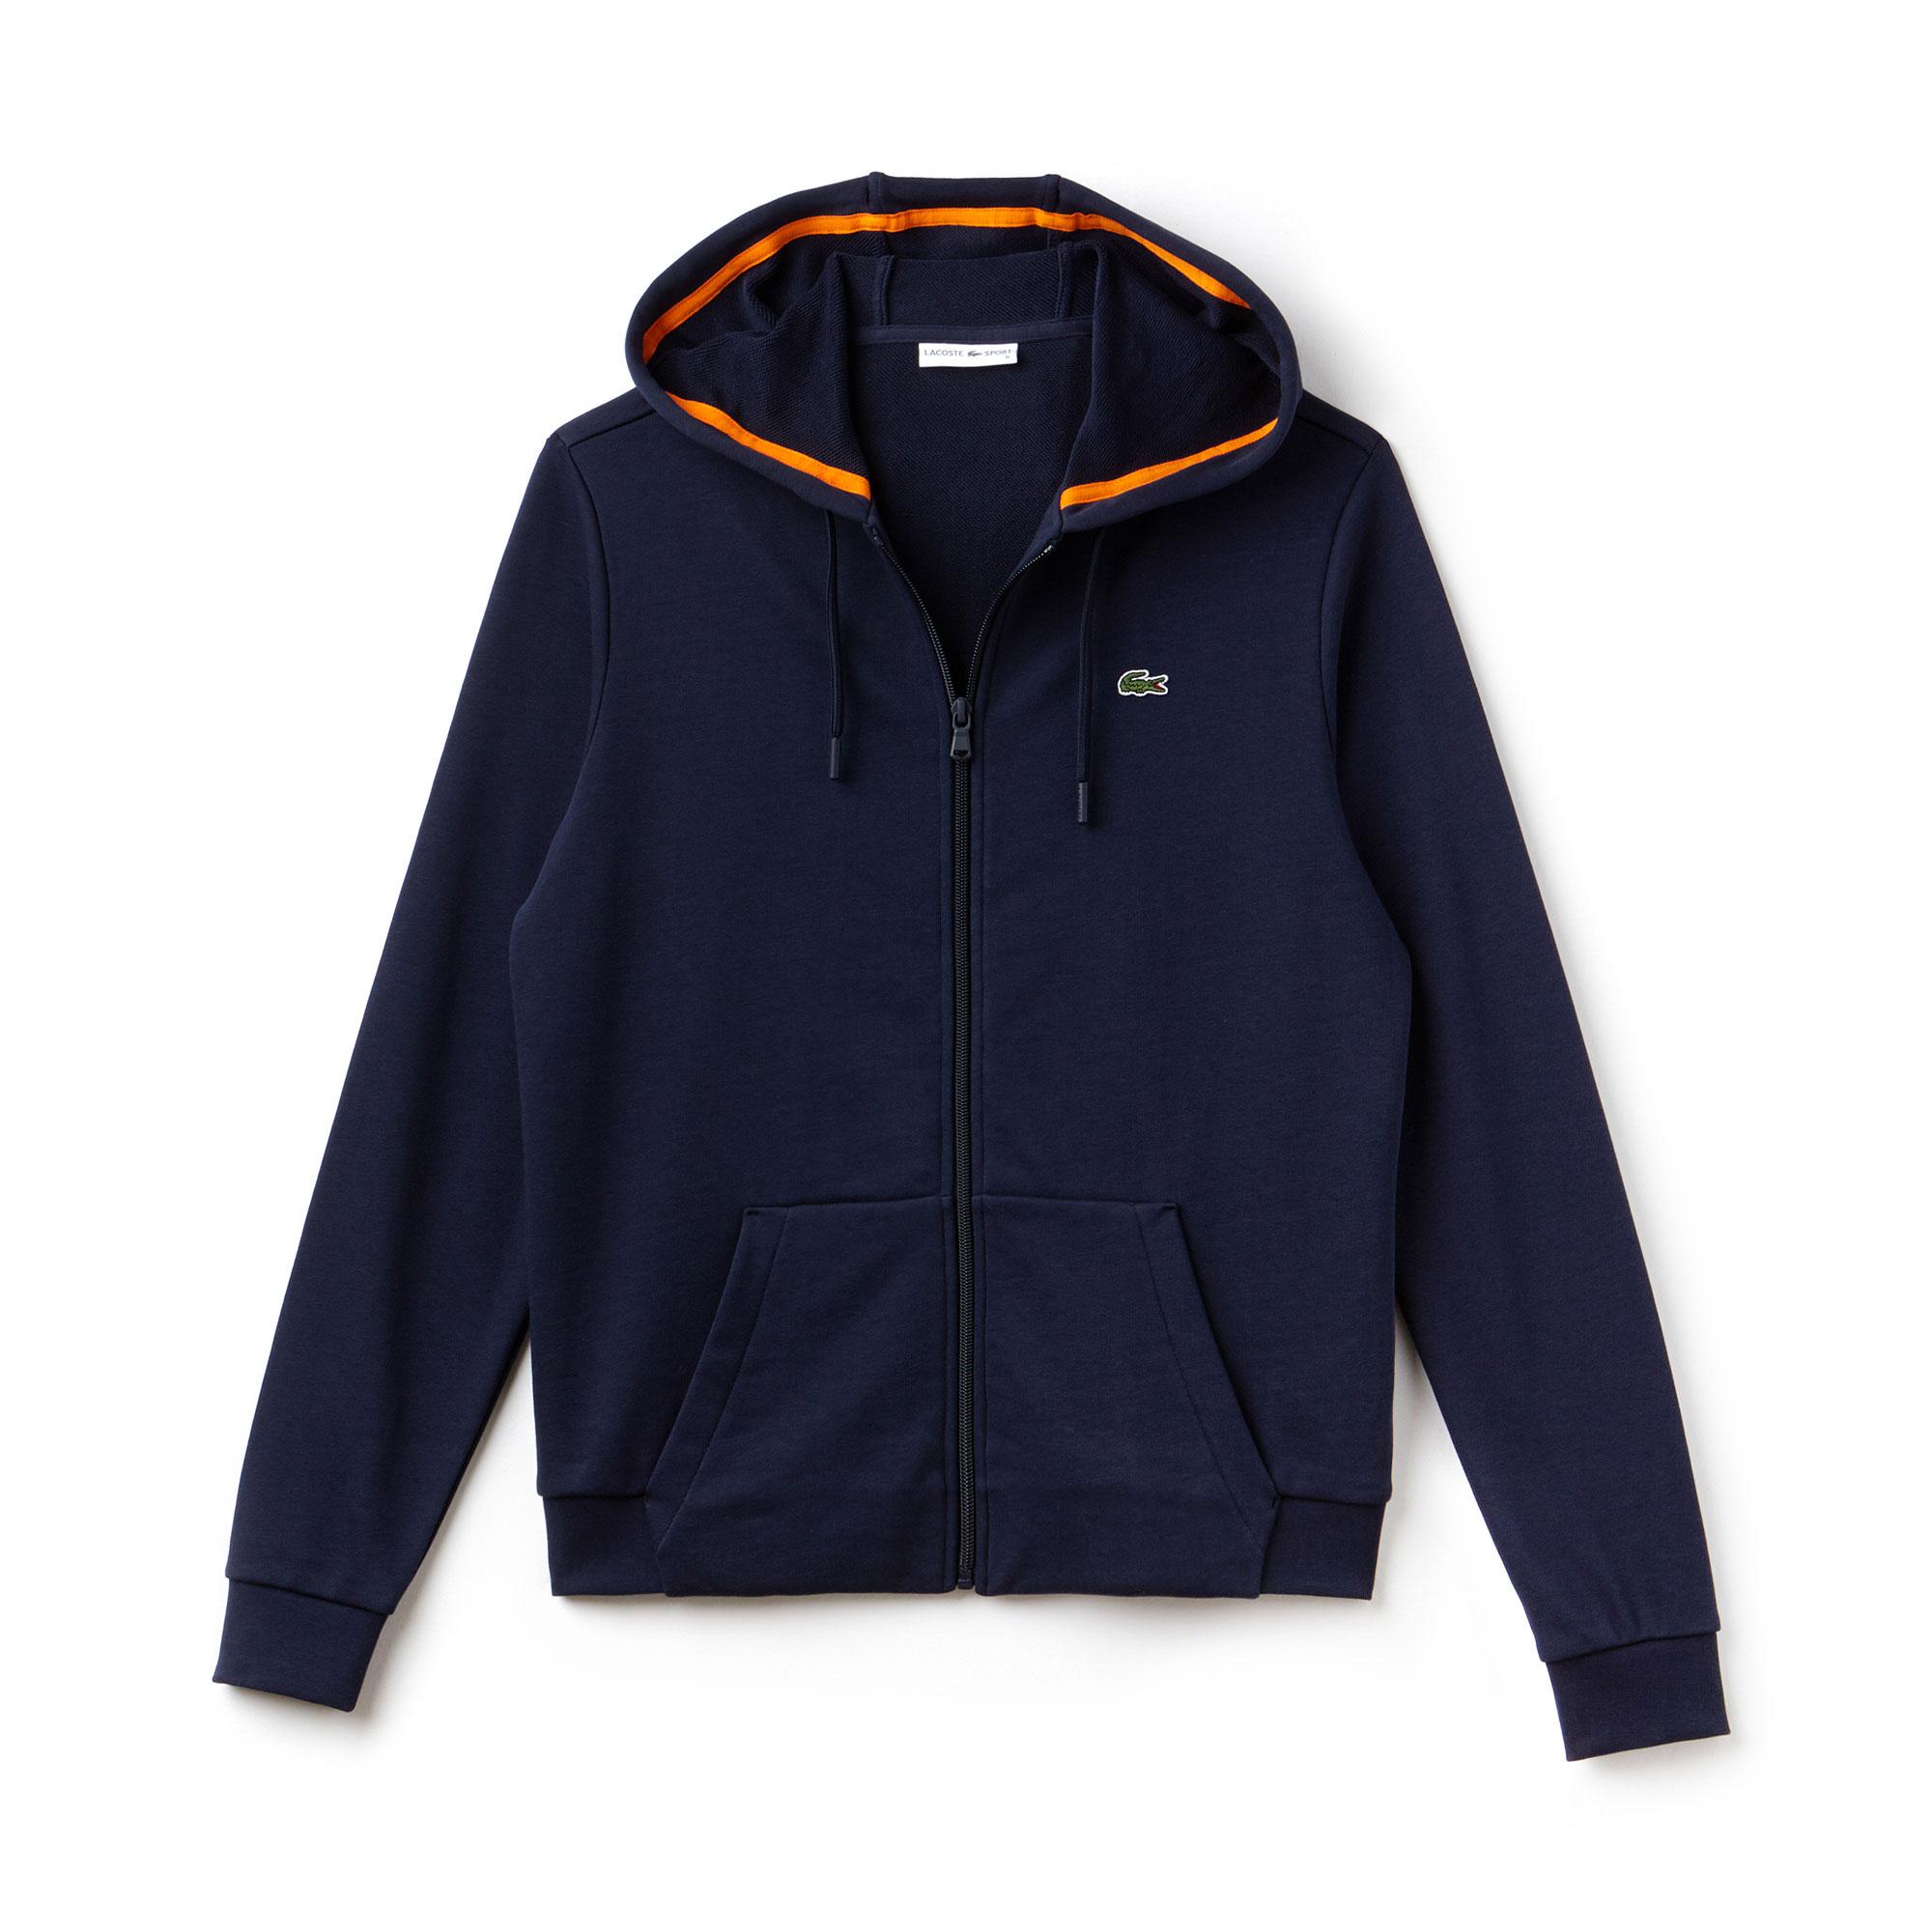 Lacoste Sport Women's Tennis Hooded Zippered Fleece Sweatshirt